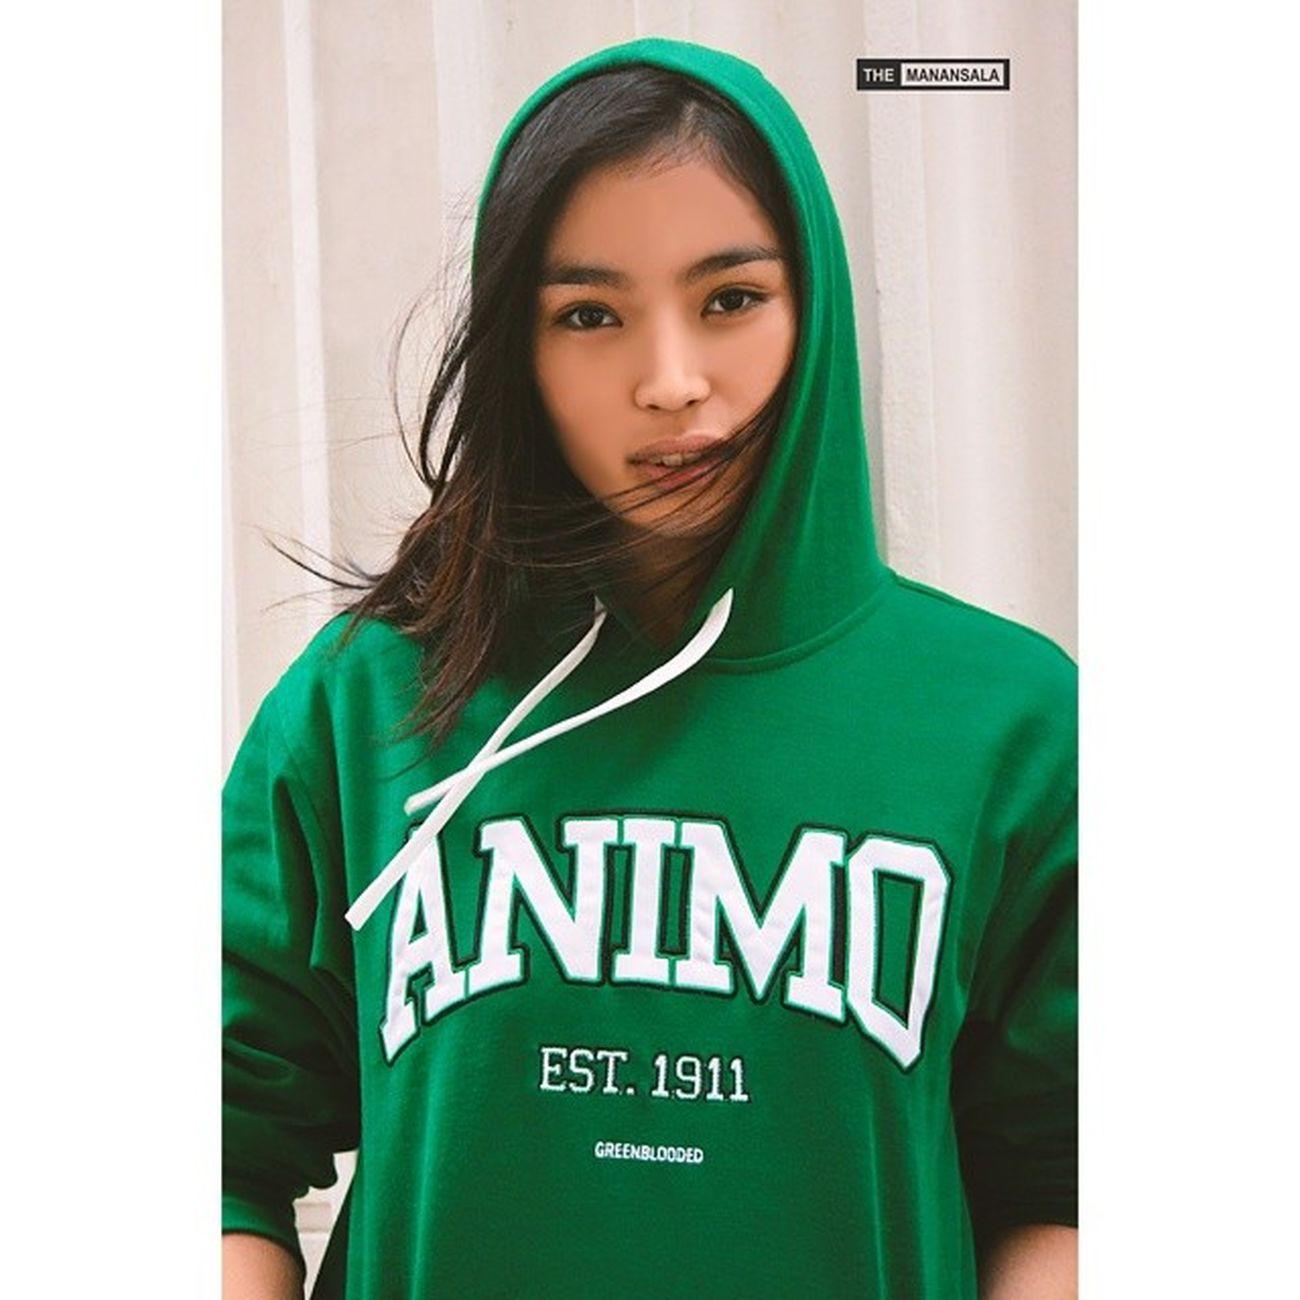 Fierce Ina Ongsiako @inaongsiako in @greenbloodedts hoodie ? . . . Greenbloodedts Topmodels Themanansala